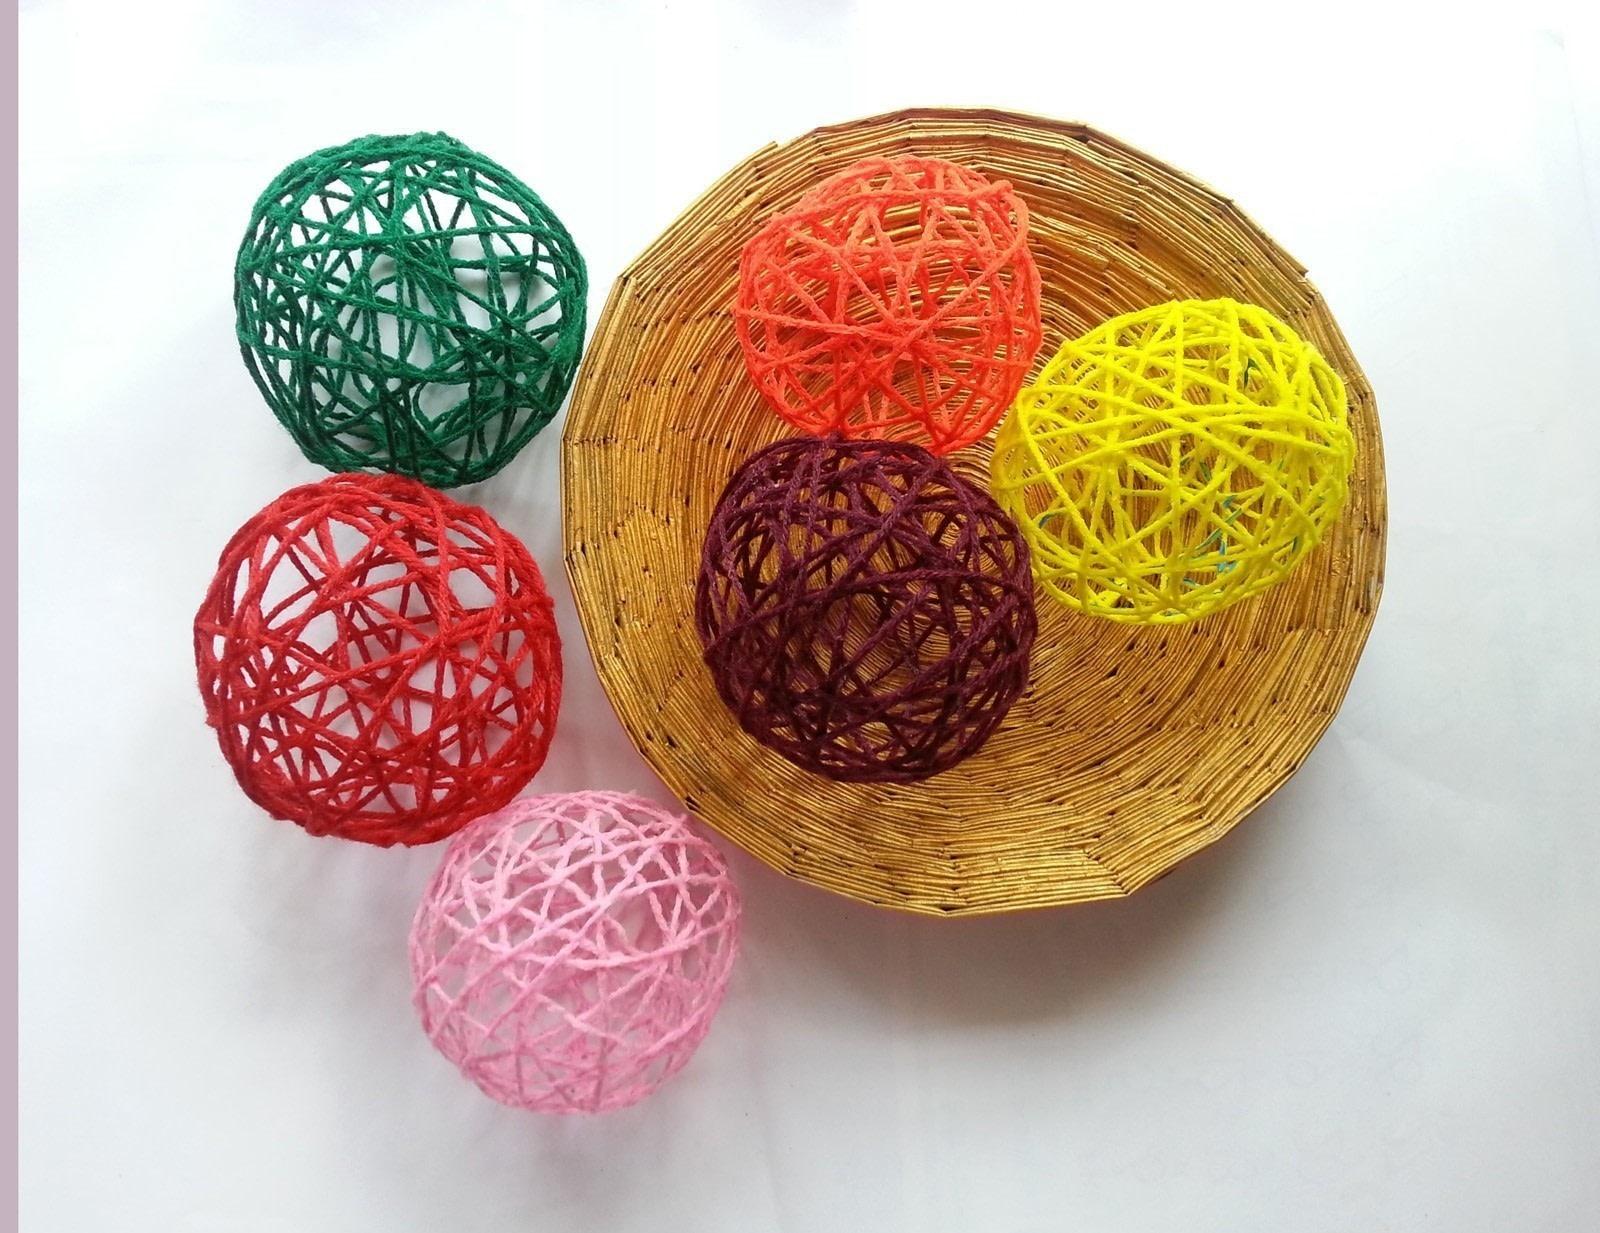 Diy Decorative Yarn Balls How To Make A Piece Of Seasonal Decor Yarncraft On Cut Out Keep